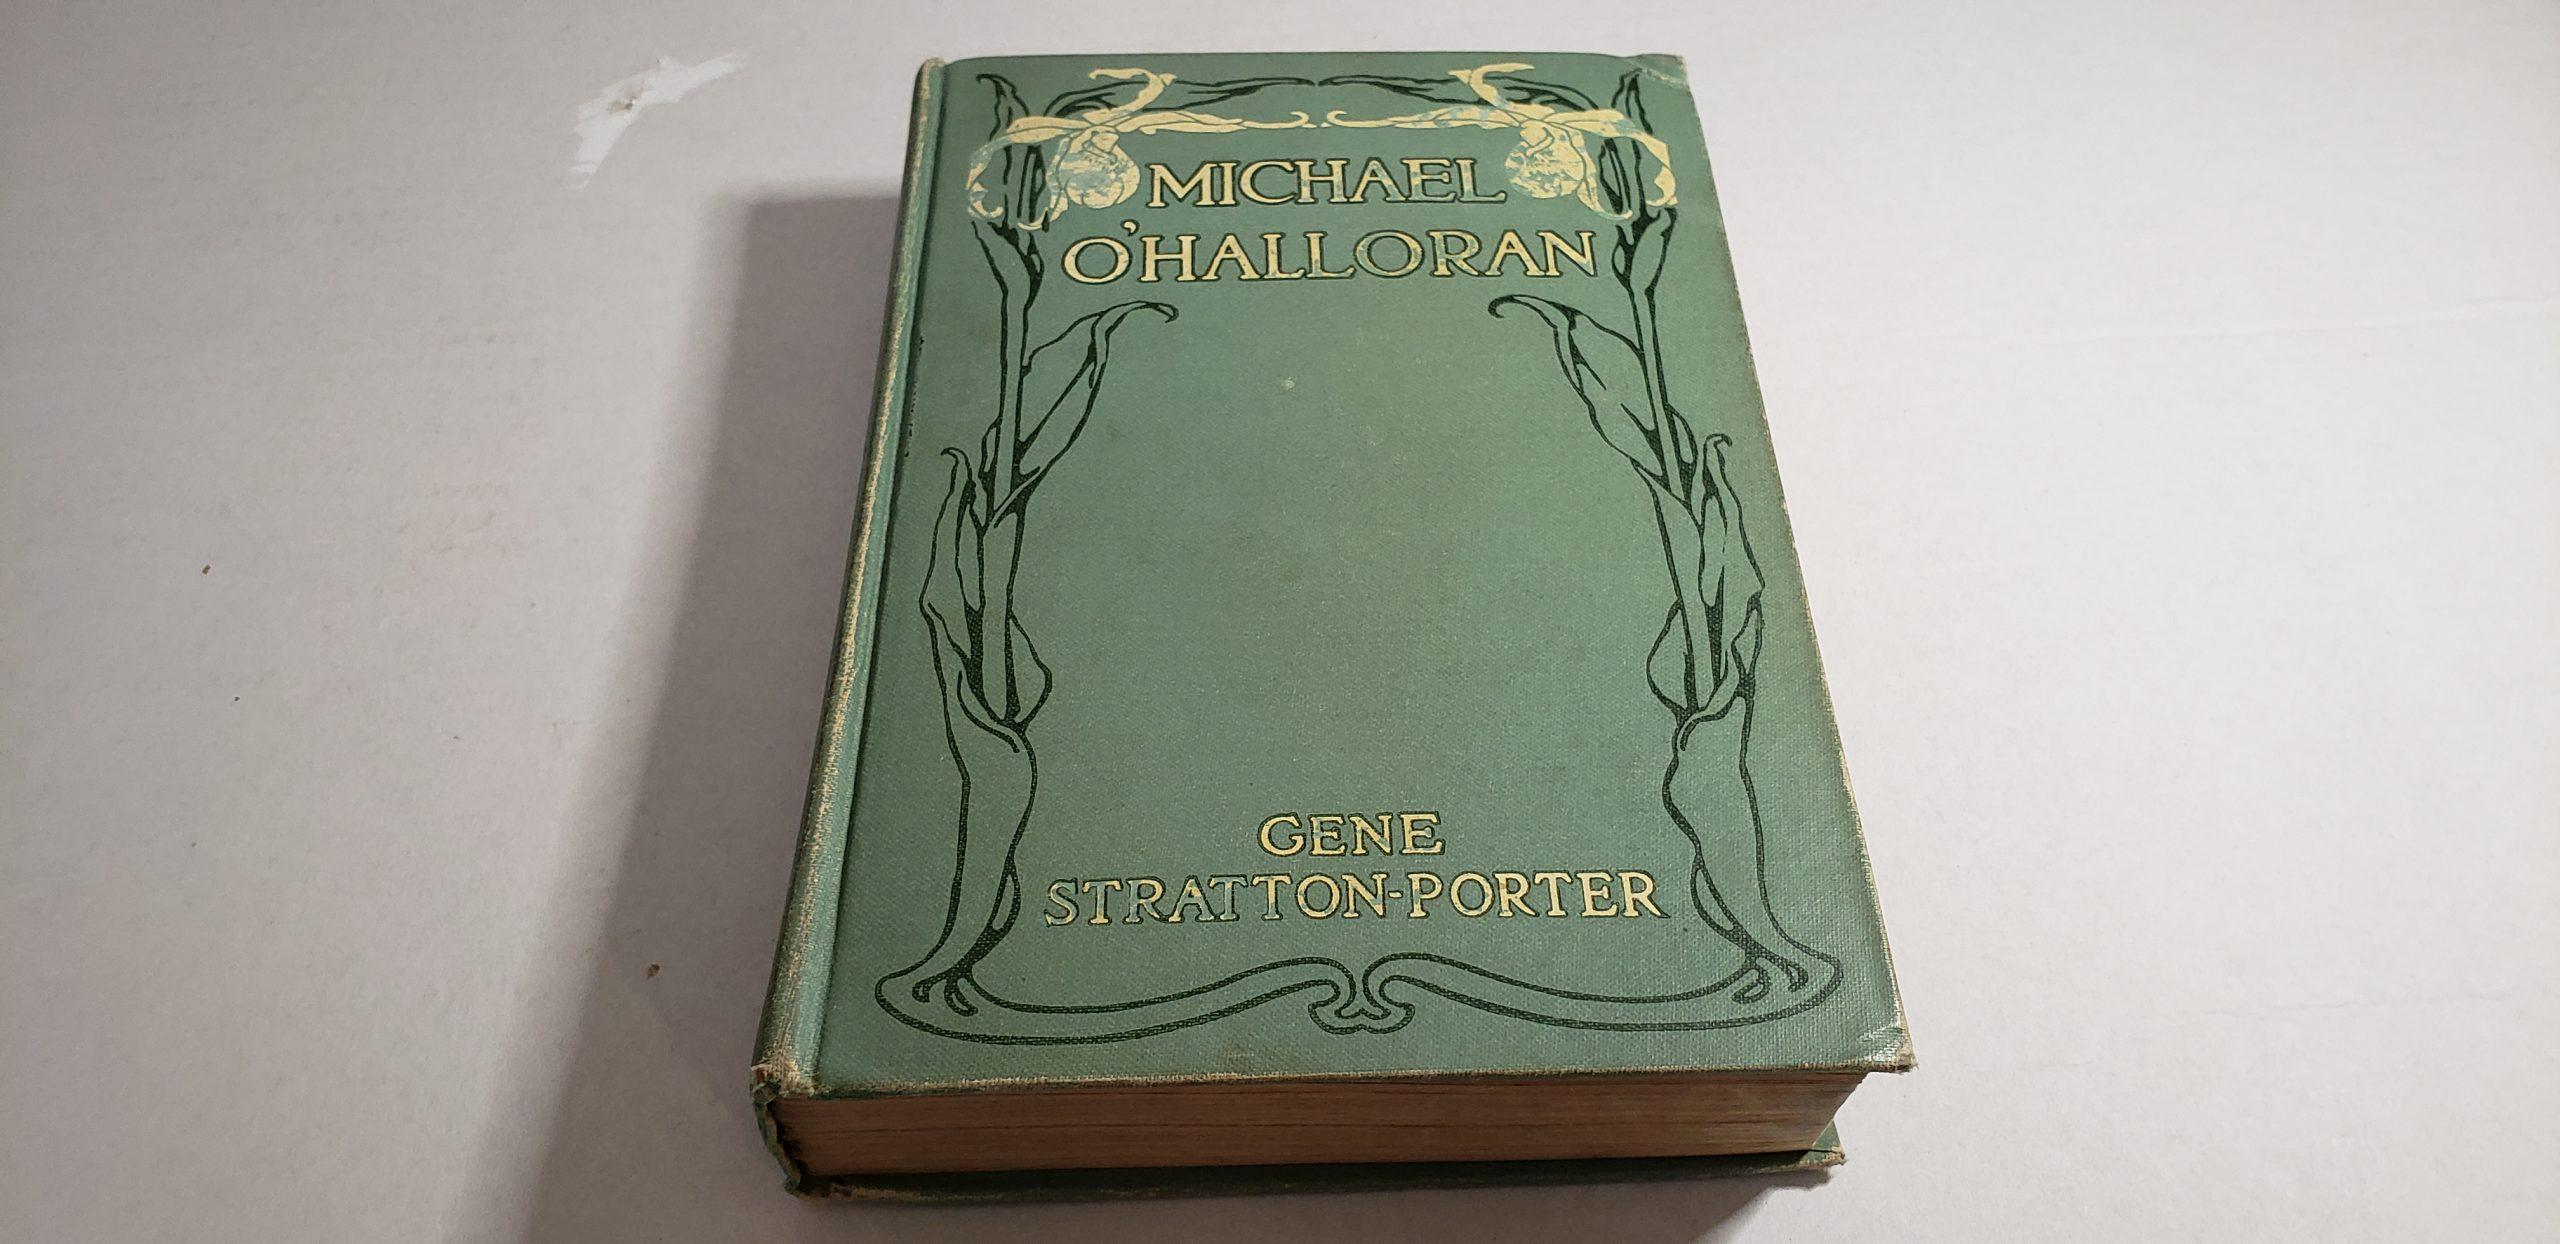 Michael O'Halloran book image